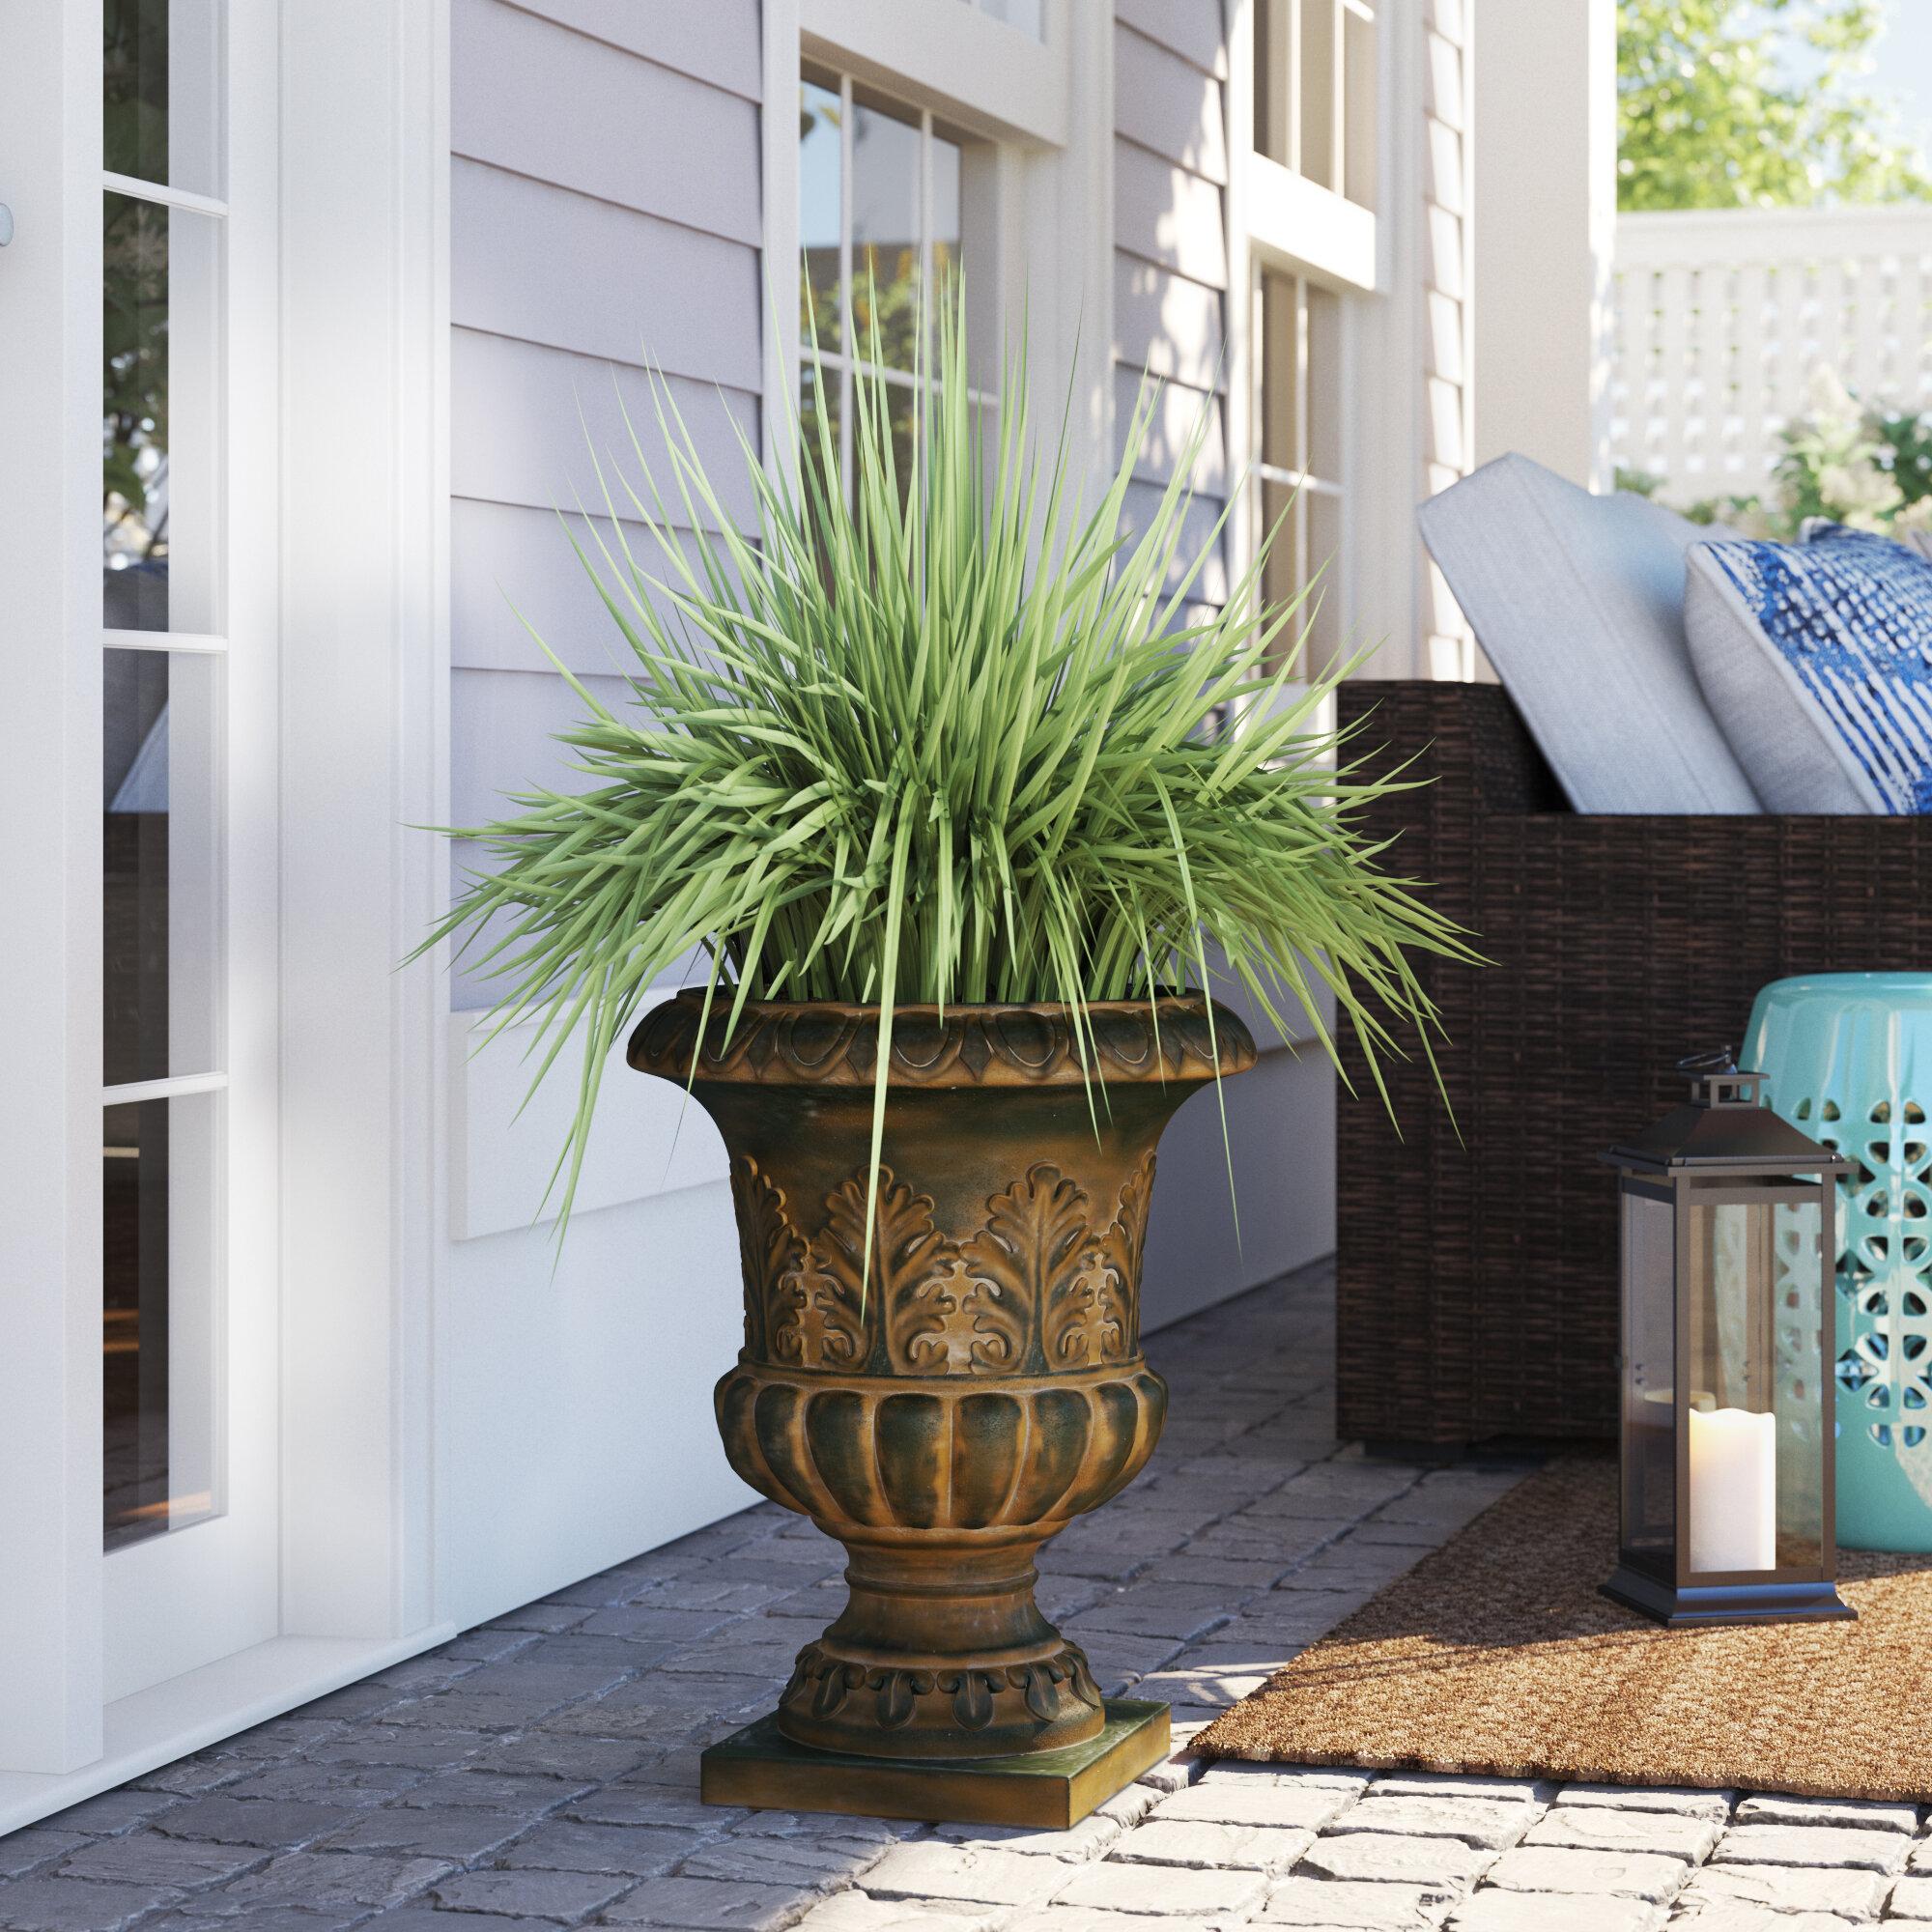 Sol 72 Outdoor Adams Weathered Decorative Fiberclay Urn Planter